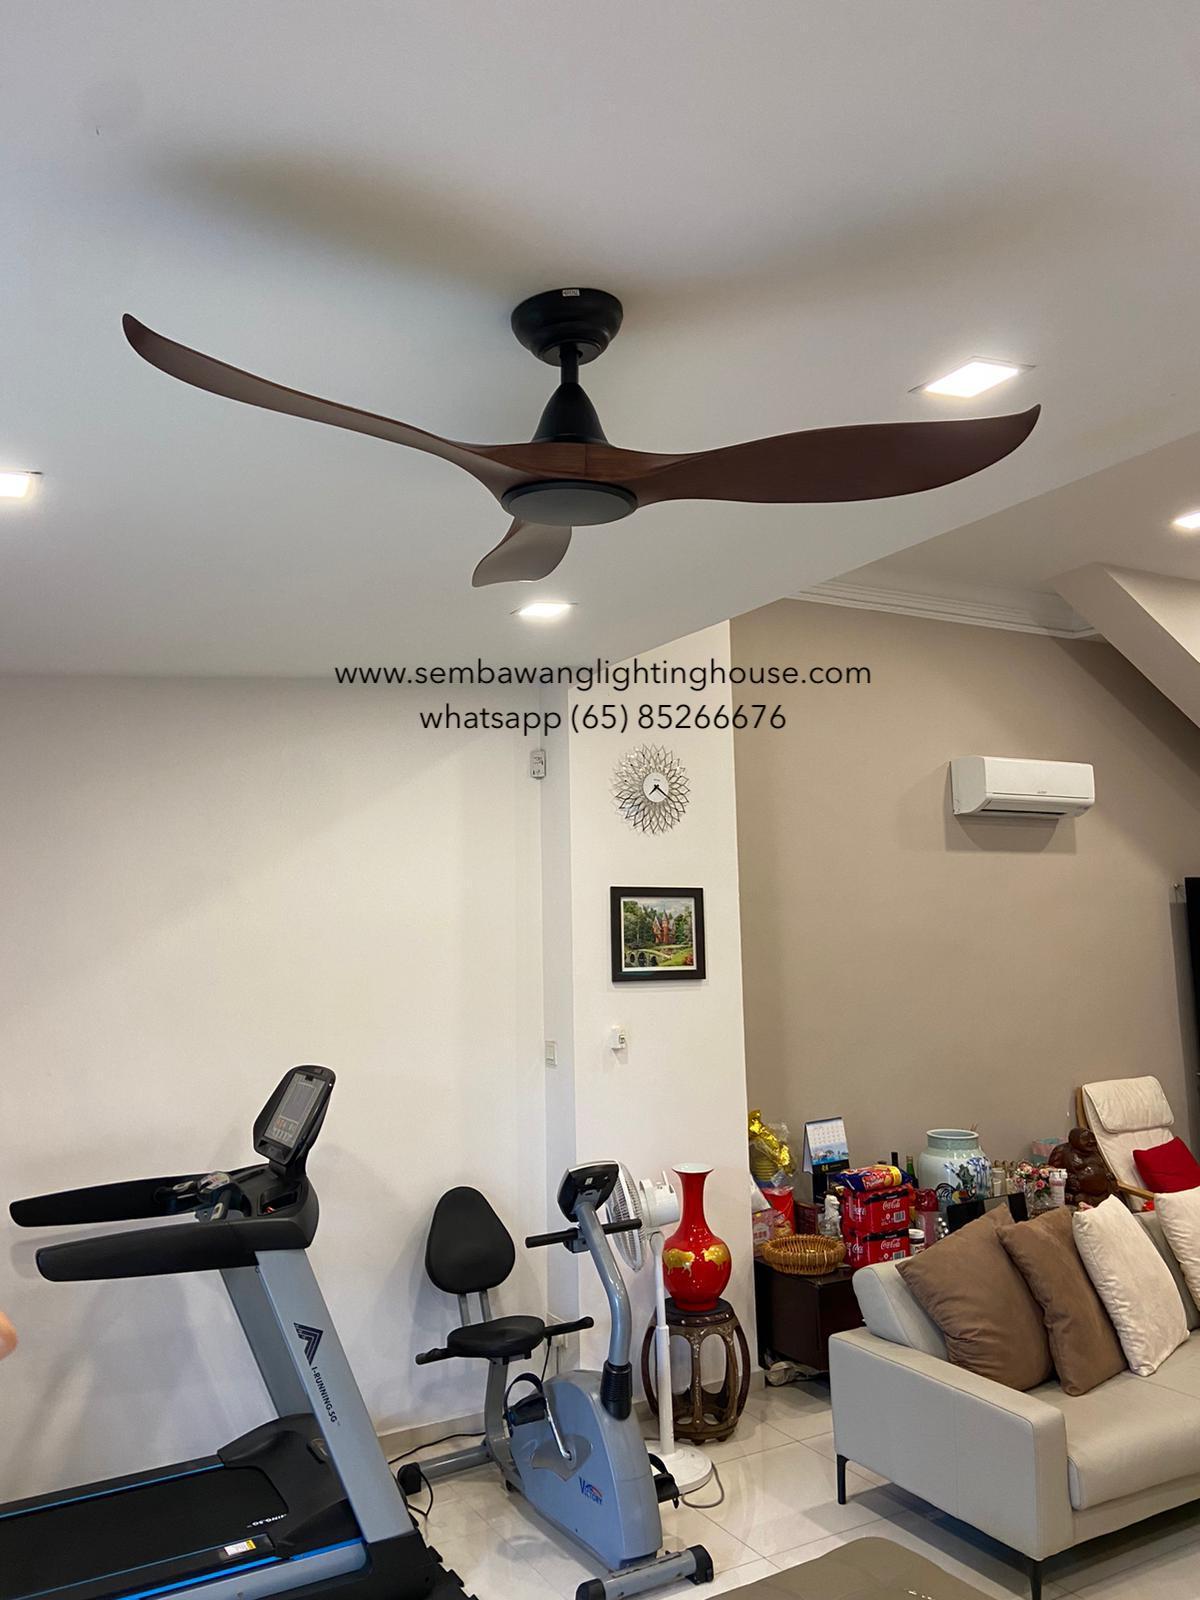 efenz-downrod-ceiling-fan-without-light-black-dutch-cocoa-22.jpeg